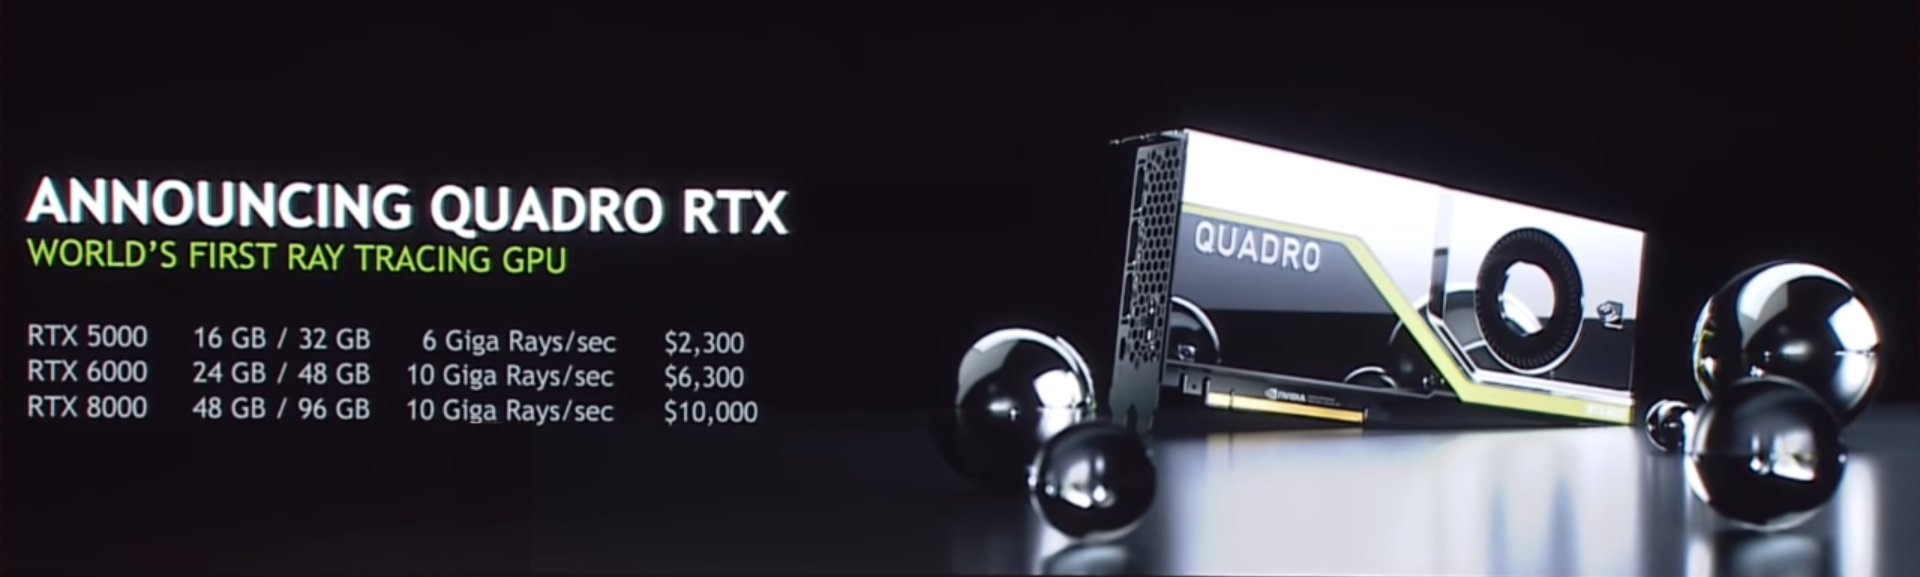 Ceny kart Quadro RTX 8000